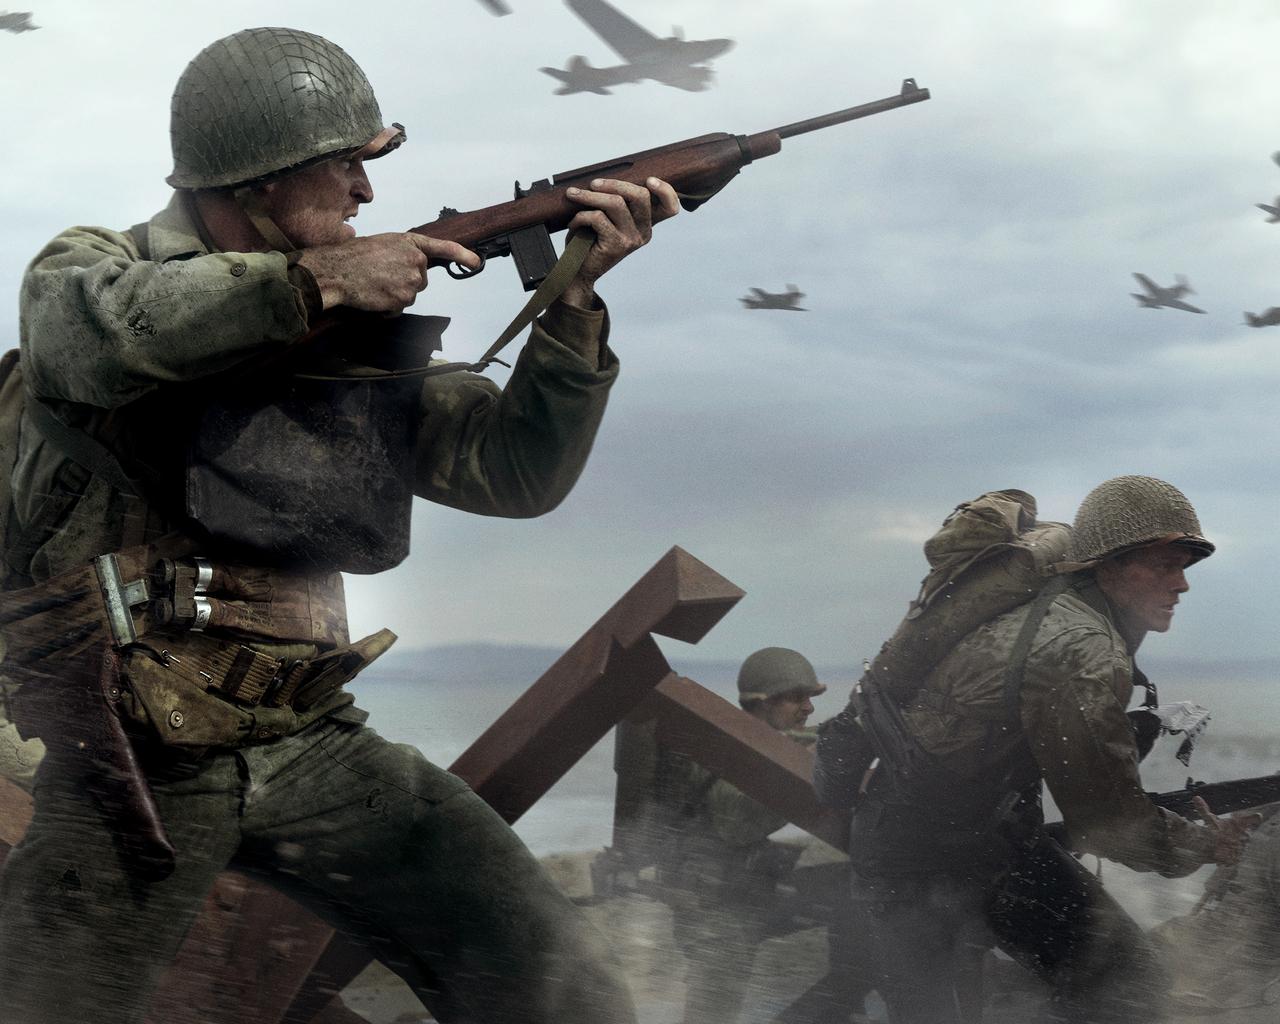 Call Of Duty Ww2 Wallpaper 4k: 1280x1024 Call Of Duty WW2 4k 1280x1024 Resolution HD 4k